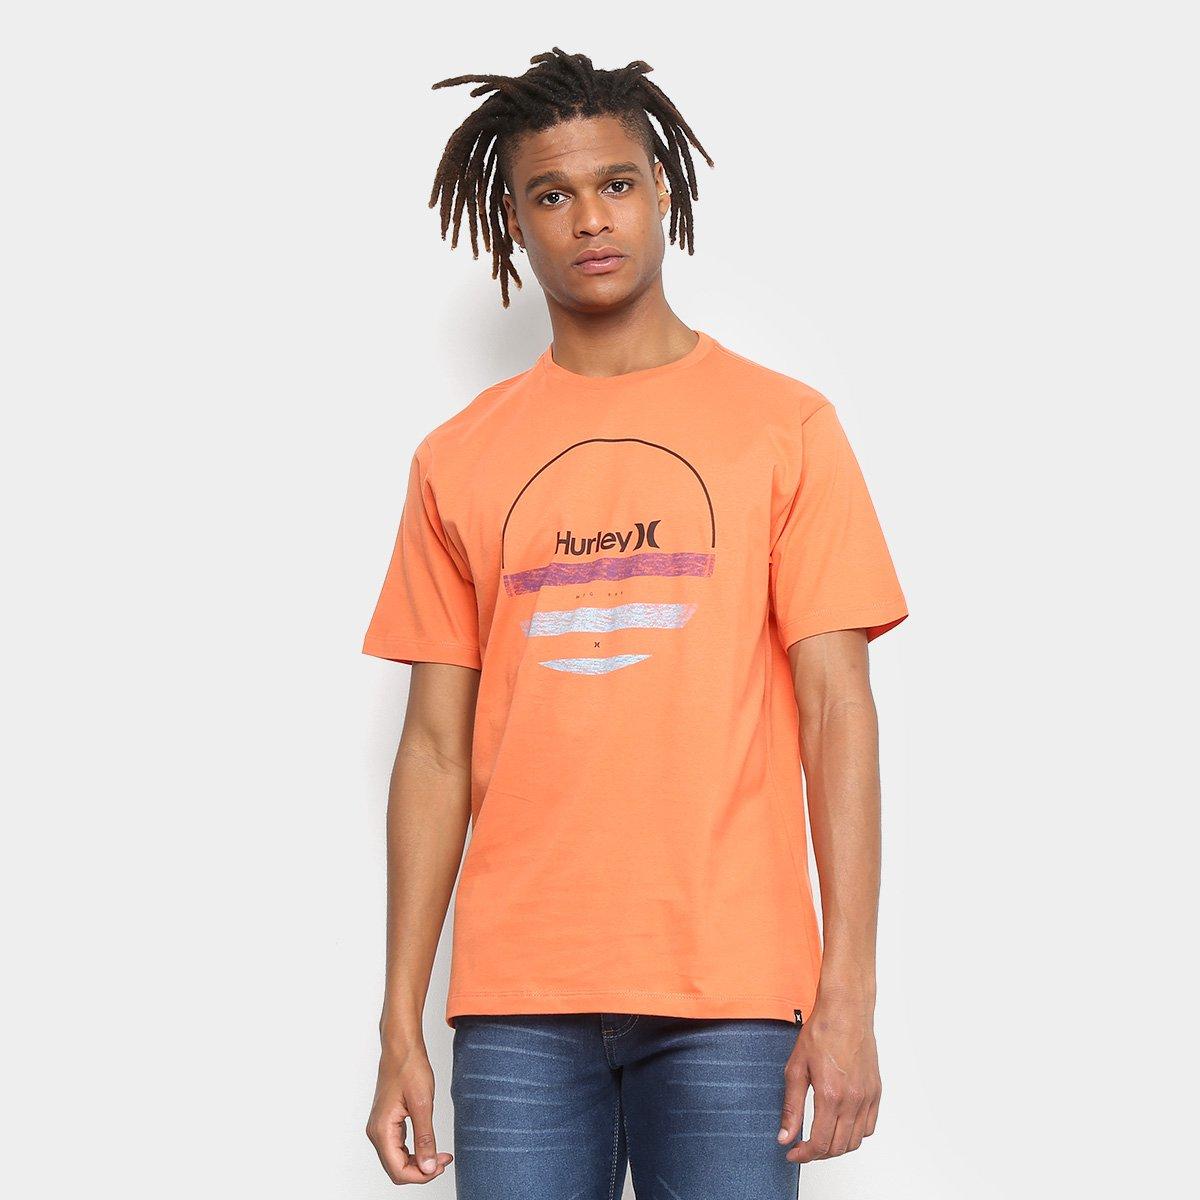 Camiseta Hurley Silk Banded Masculina - Laranja - Compre Agora ... ea39ec001bc